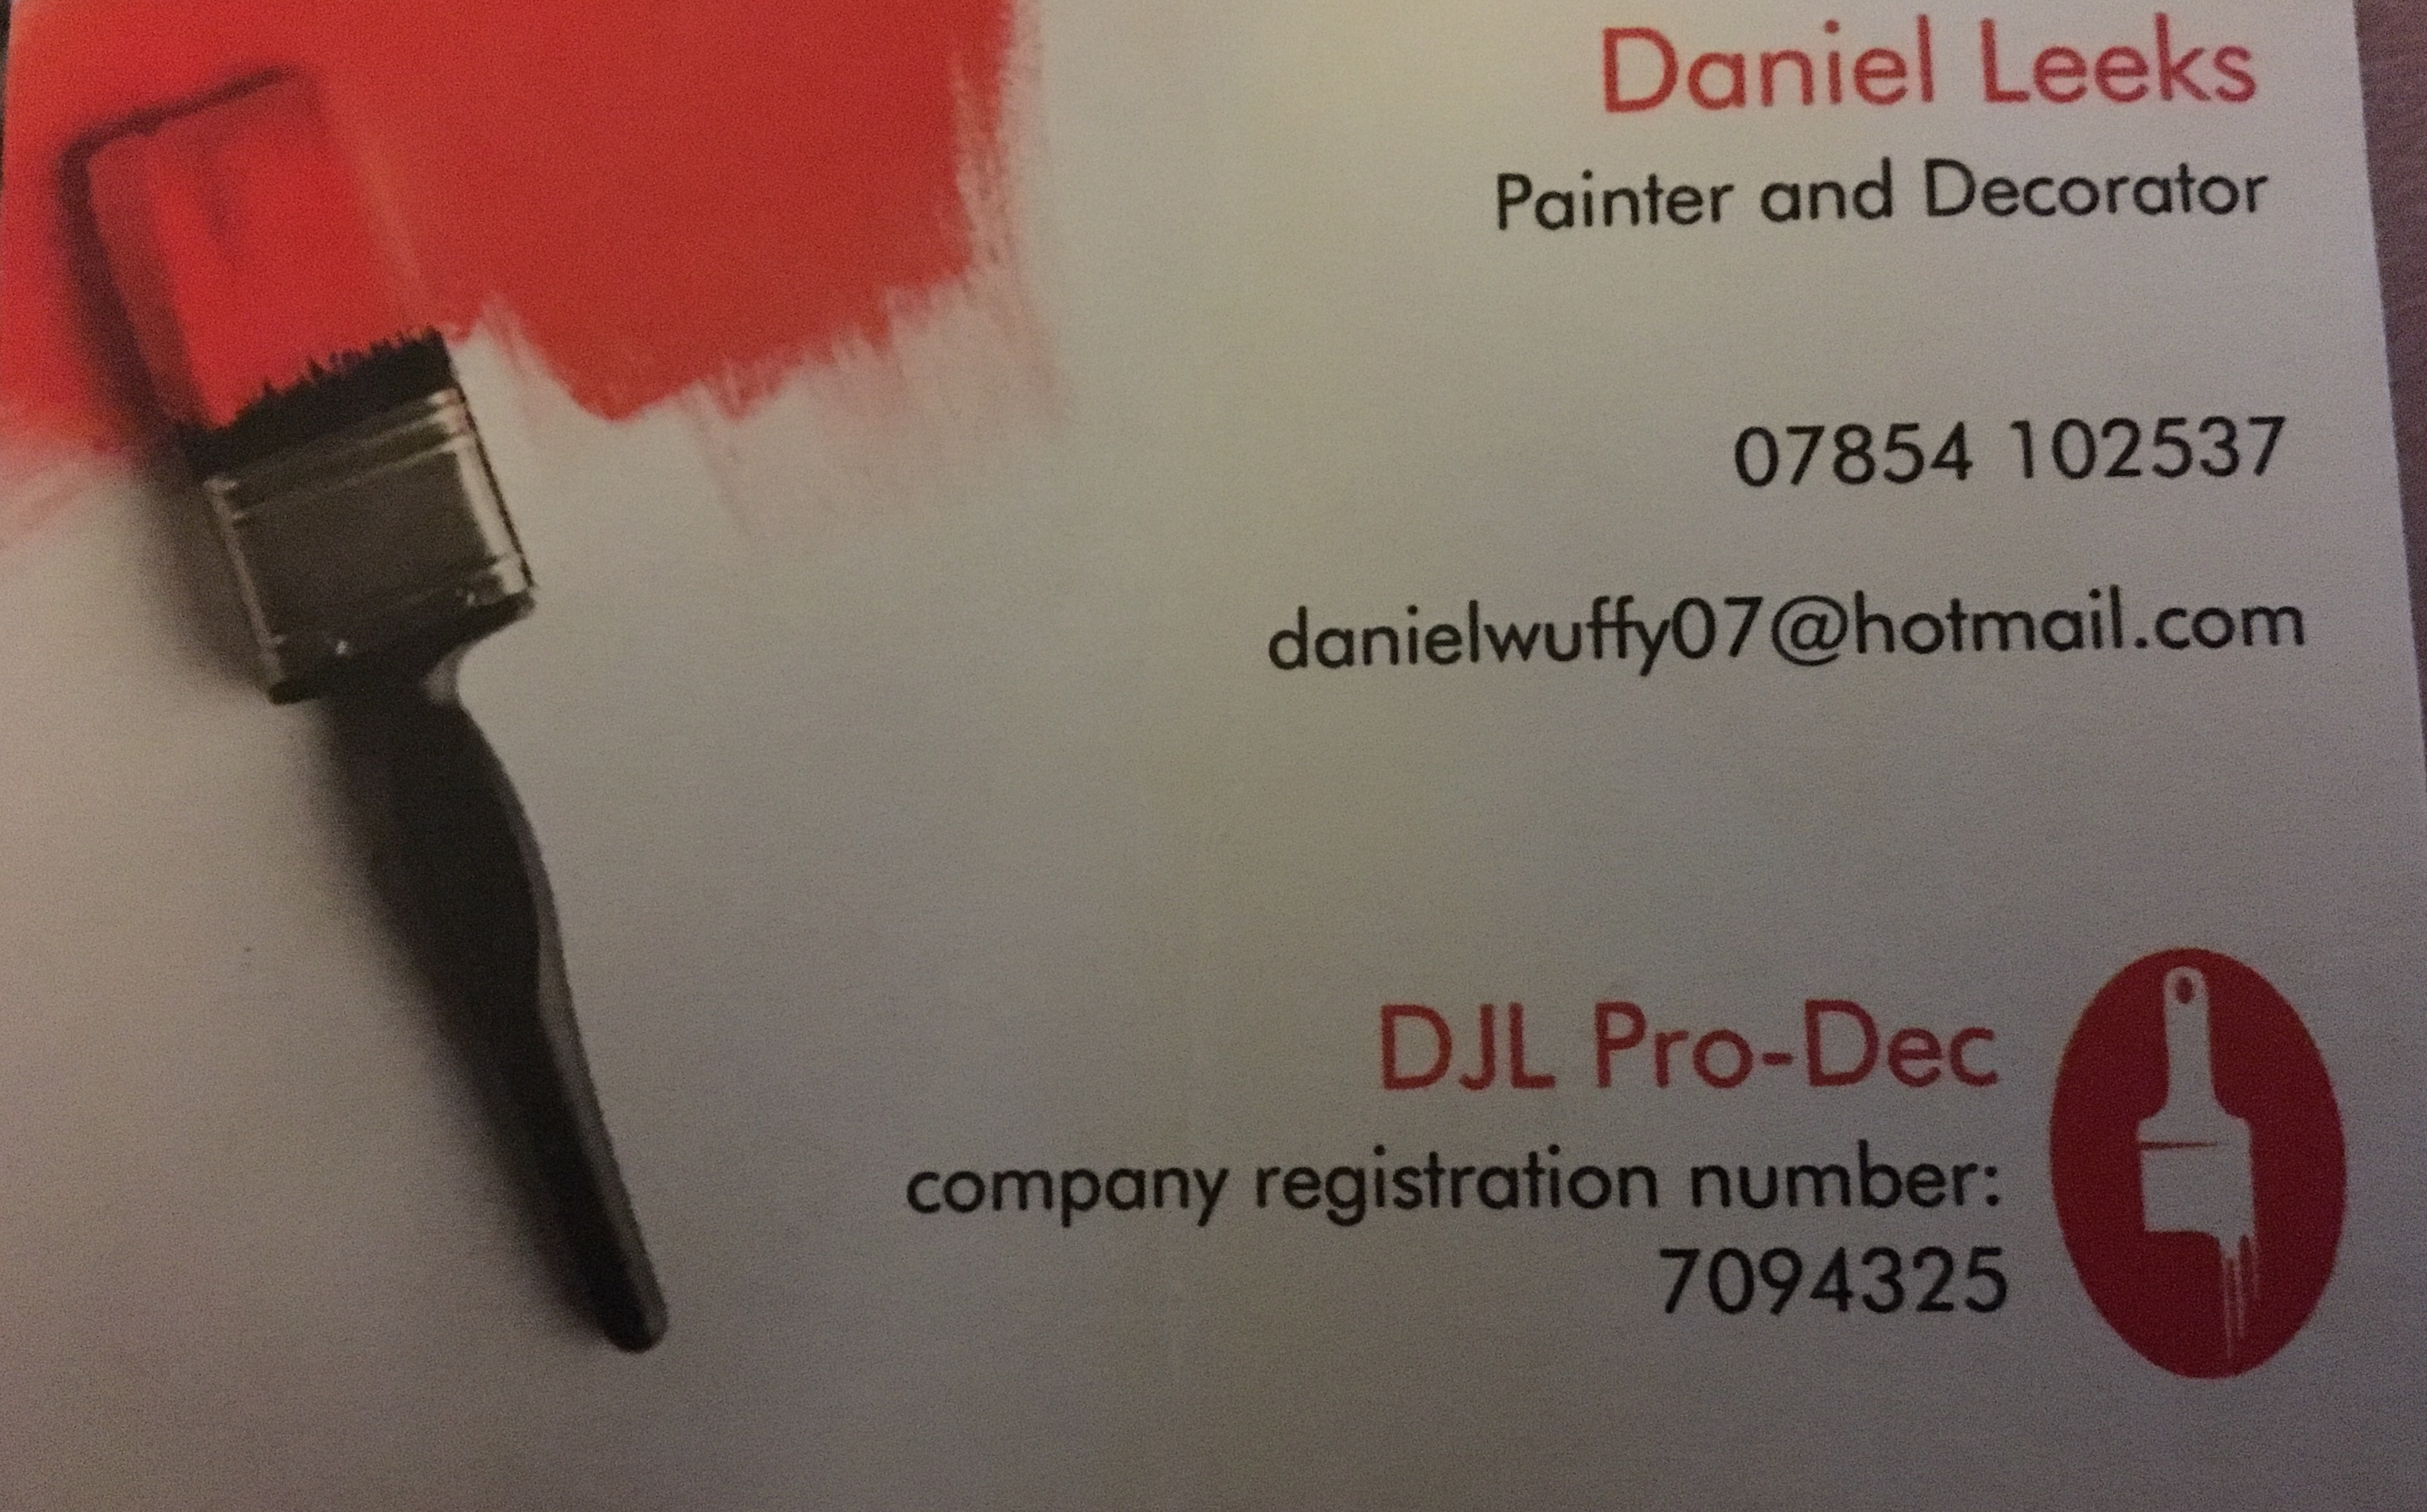 Daniel Leeks